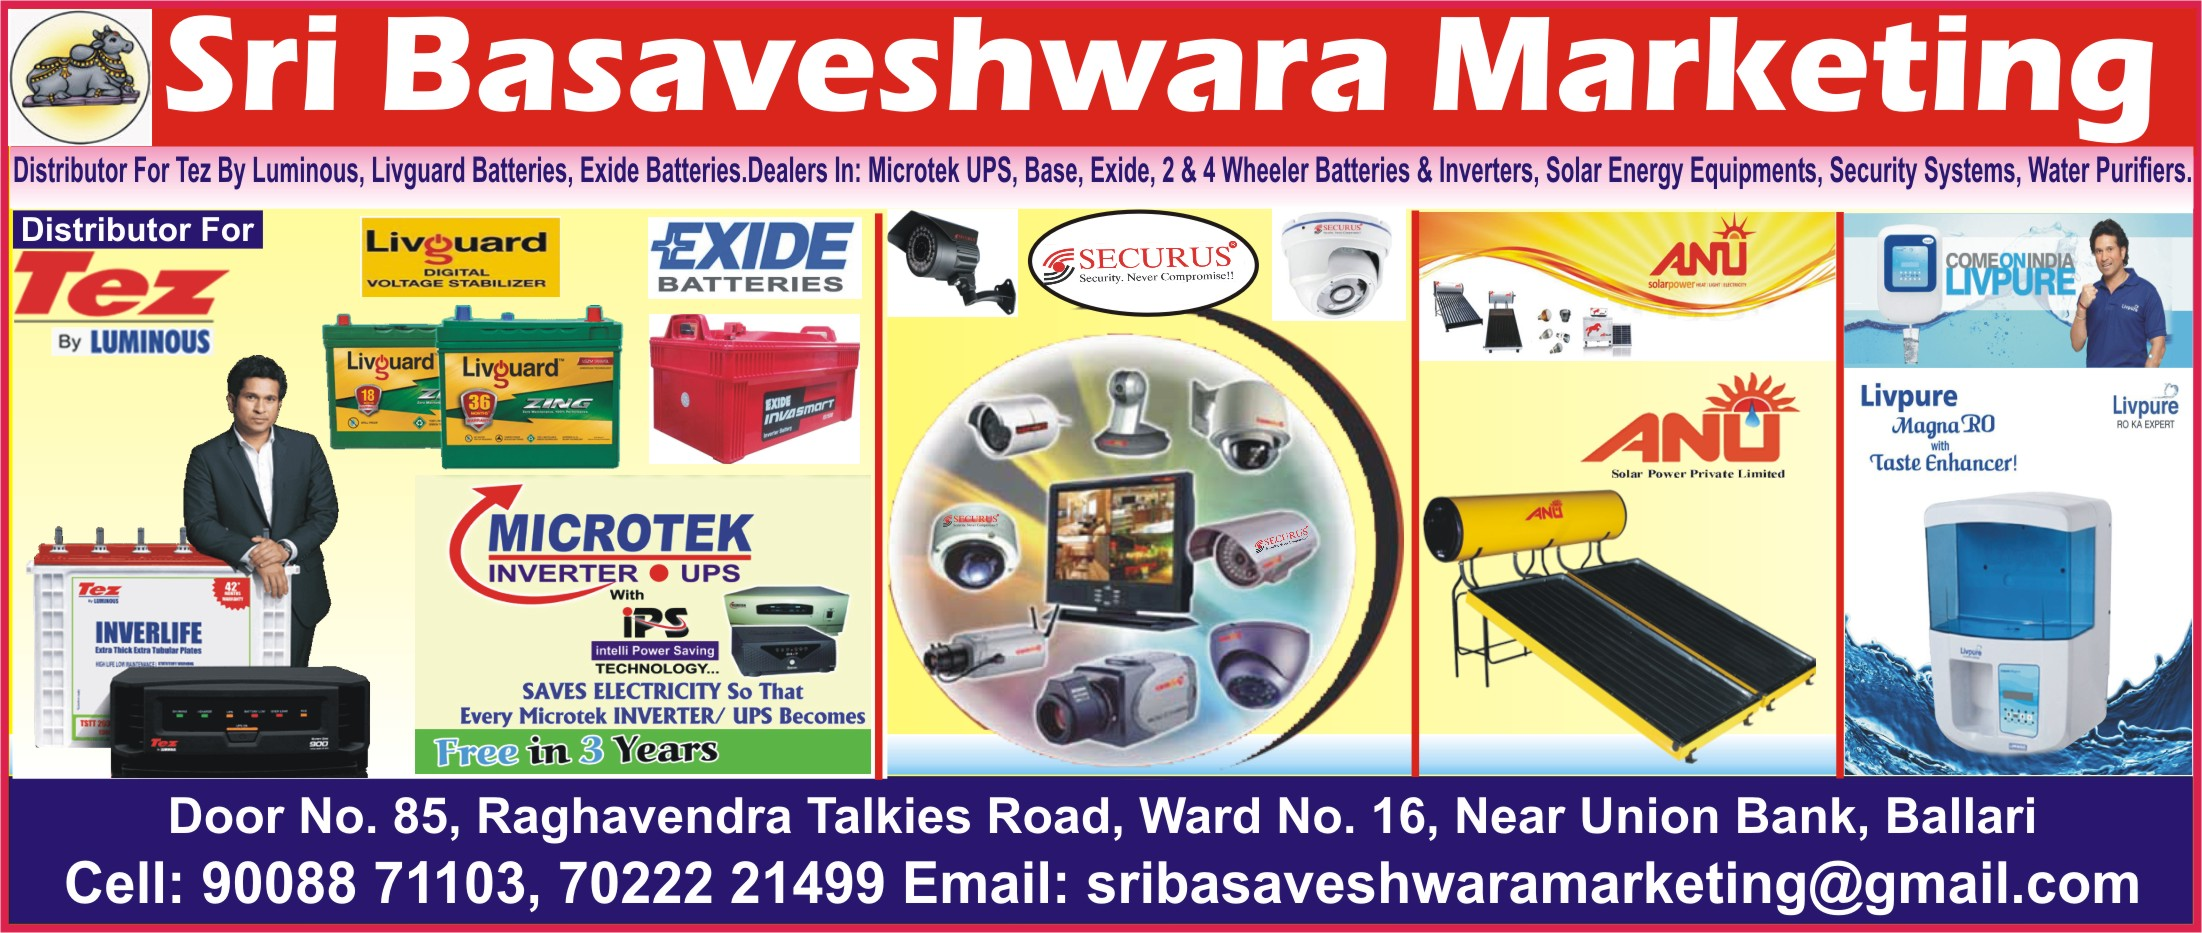 Sri Basaveshwara Marketing